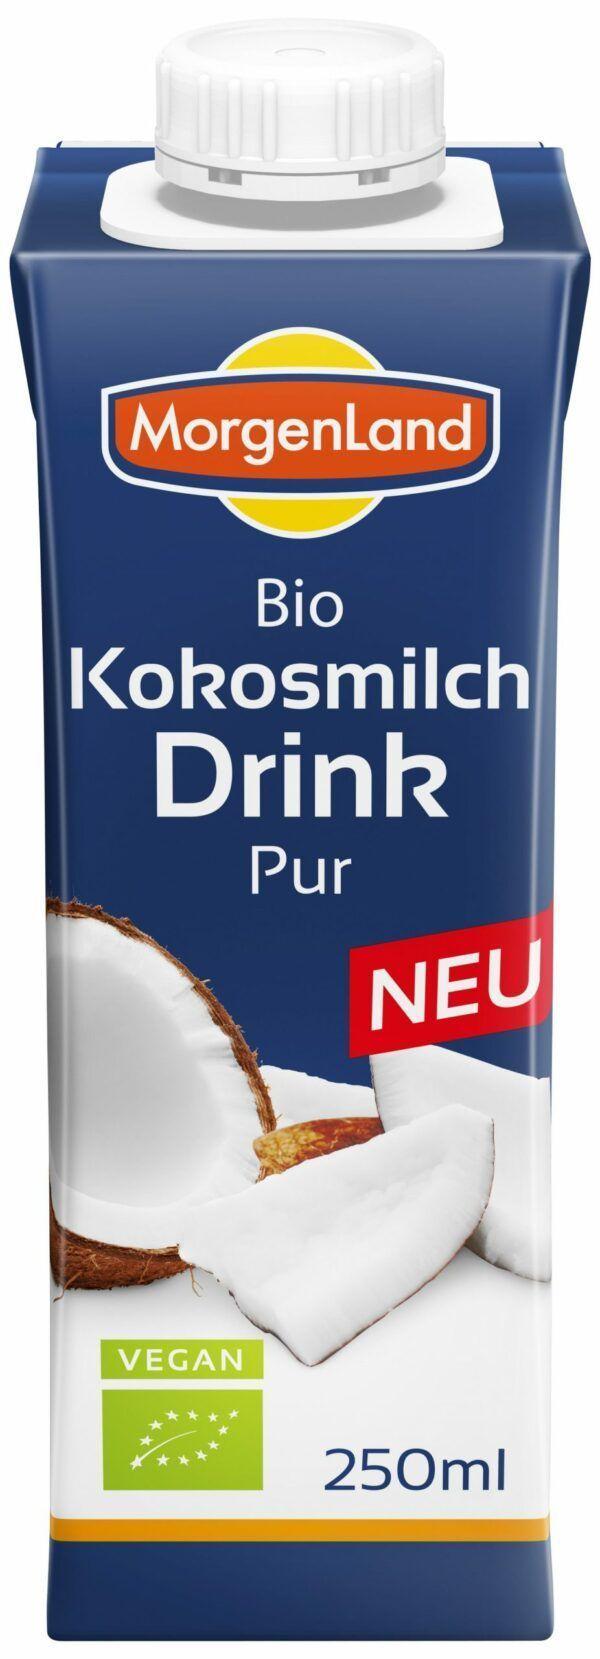 MorgenLand Kokosmilch Drink Pur 12x250ml